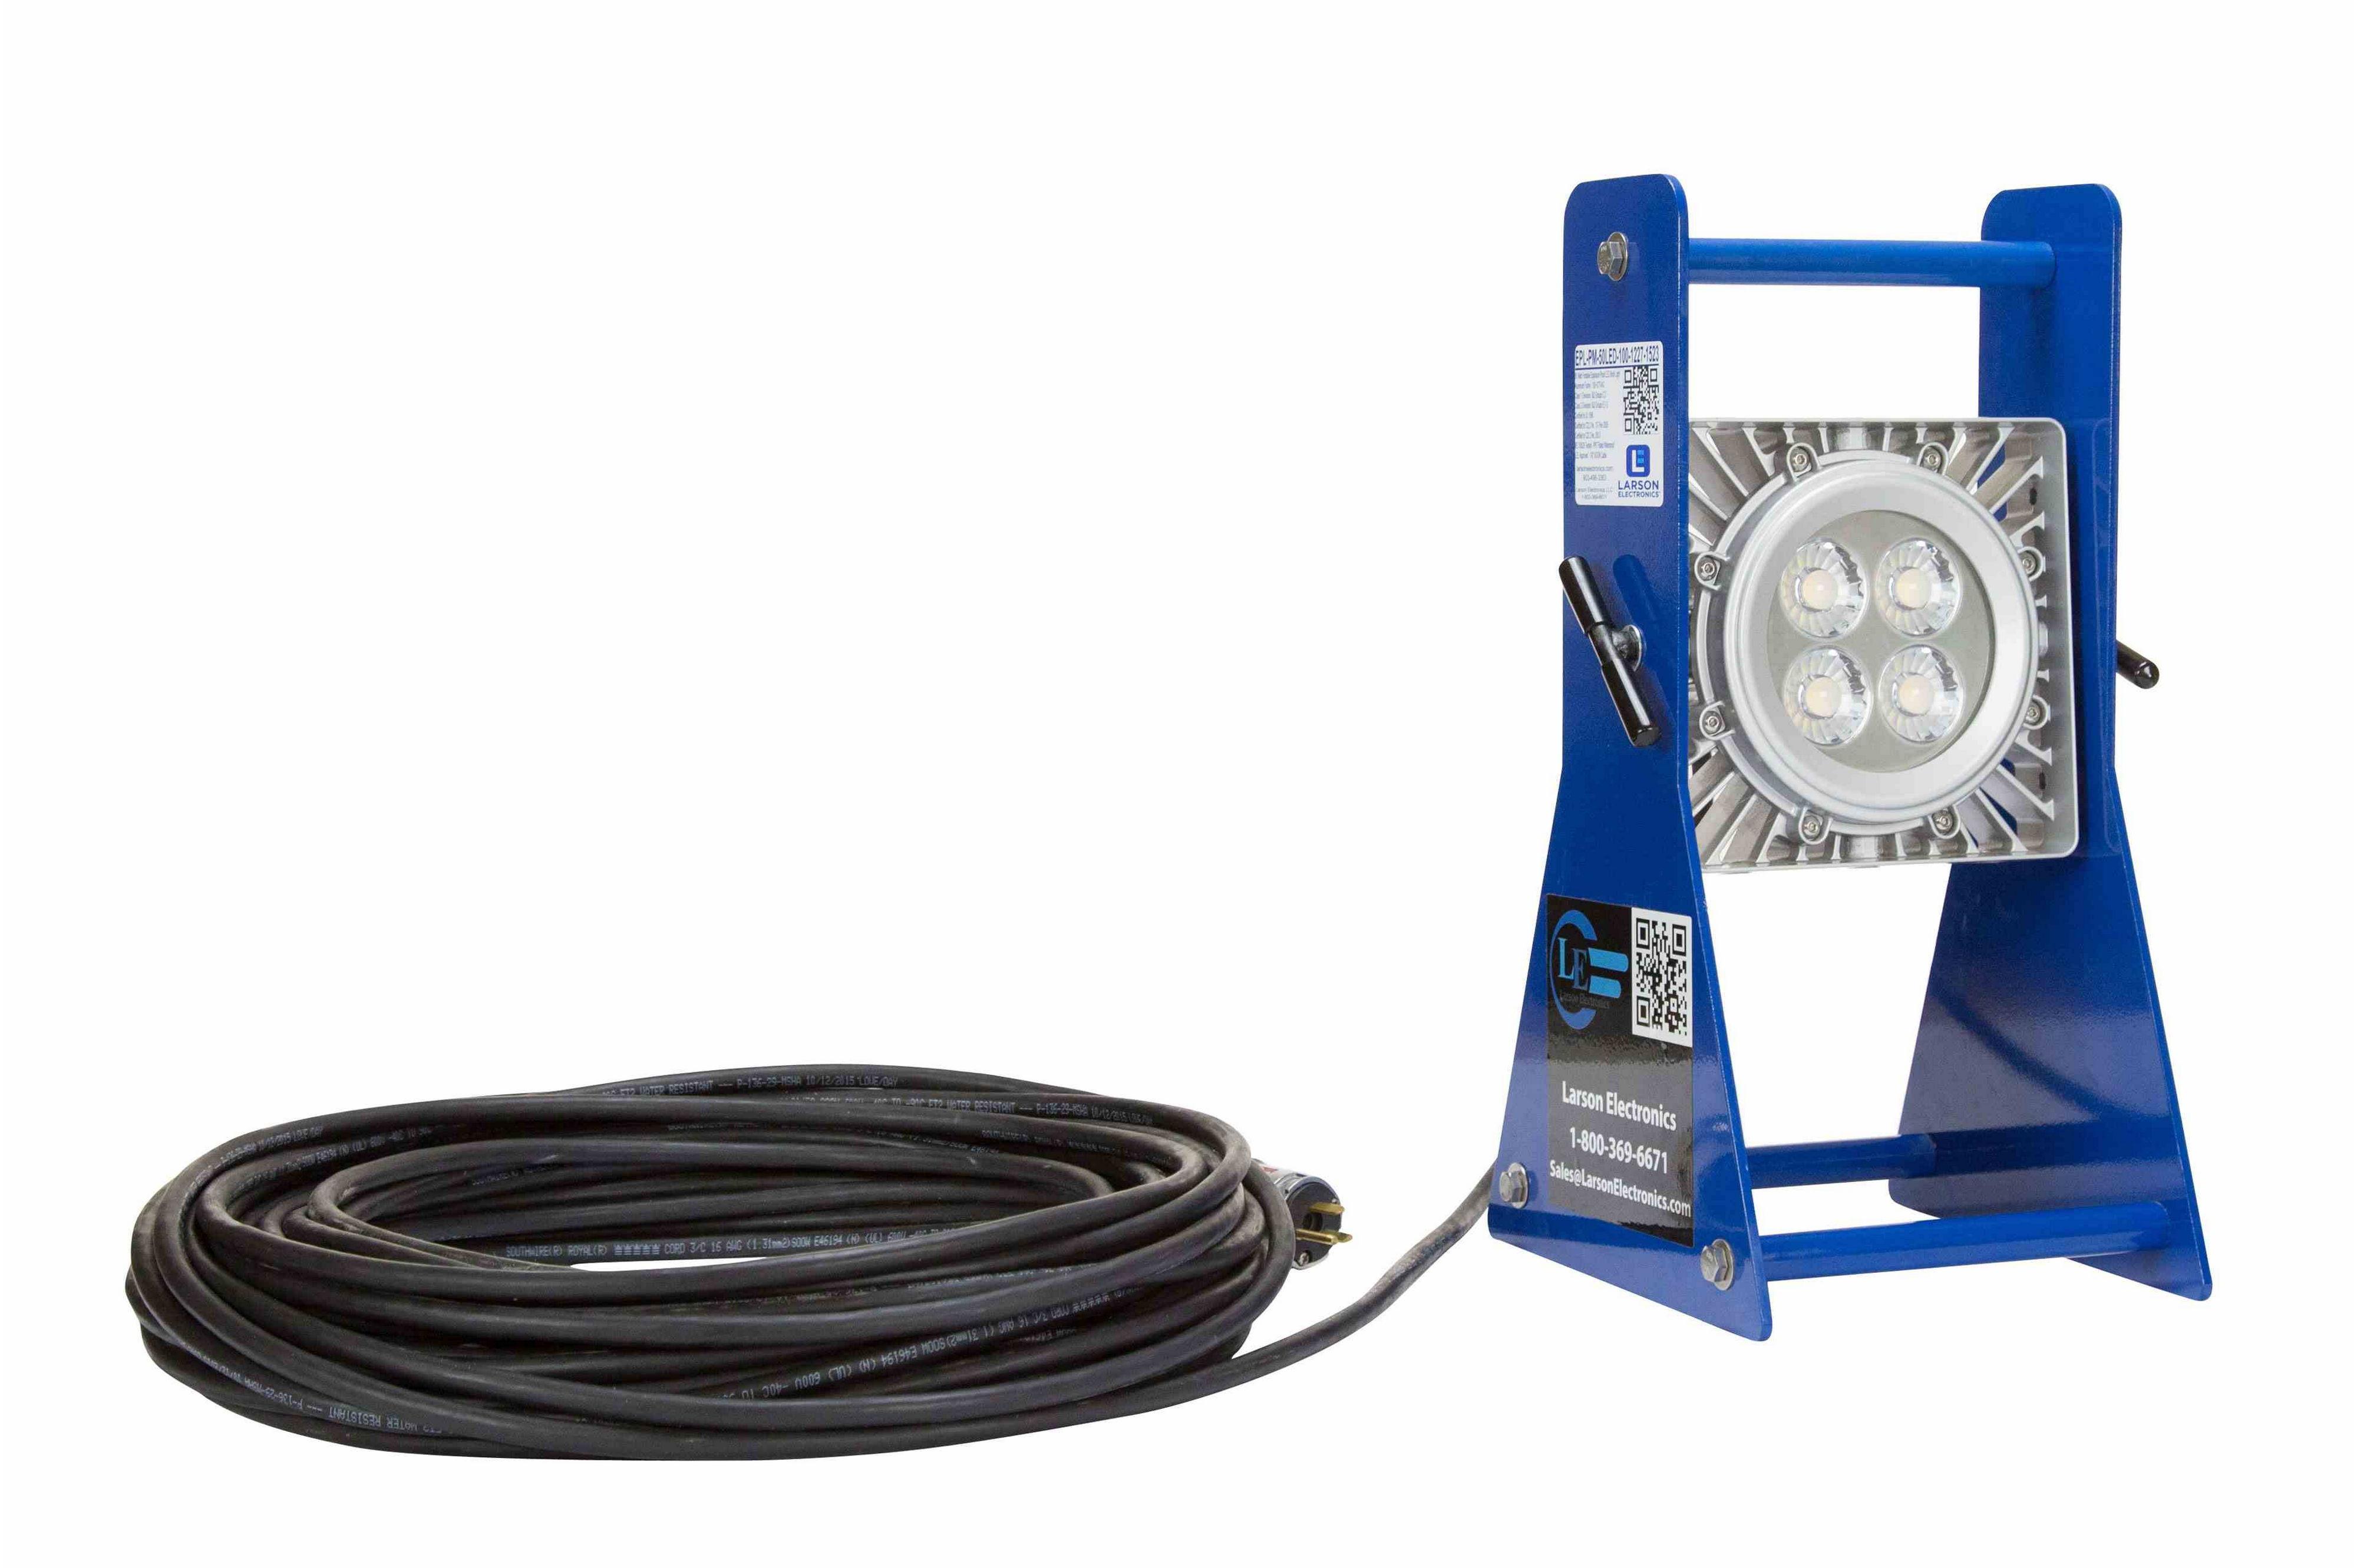 50 Watt Portable Explosion Proof Mini LED Brick Light C1D1C2D1 – Explosion Proof Light Wiring Diagram